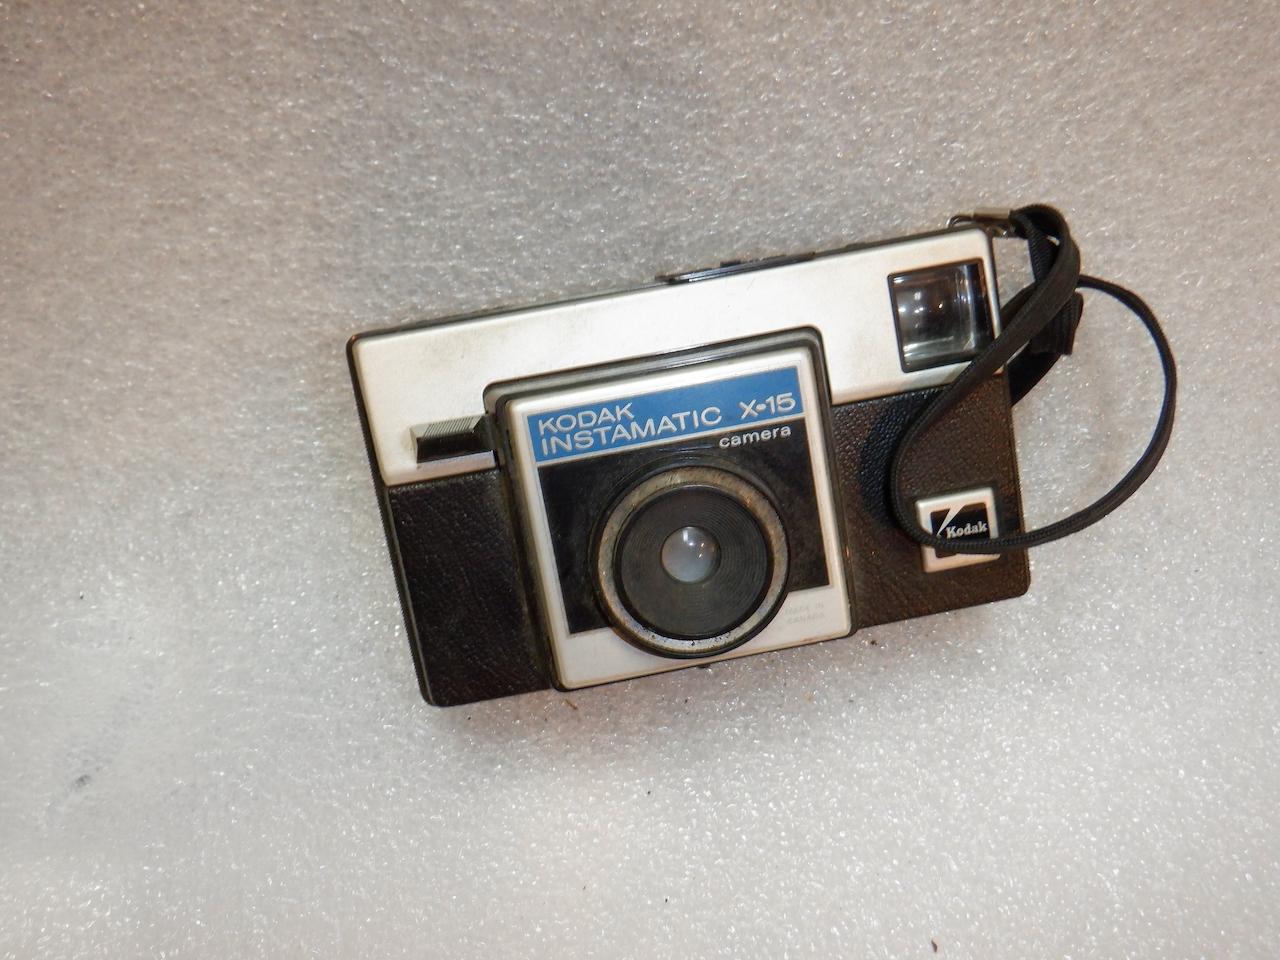 Kodax Instamatic x-15